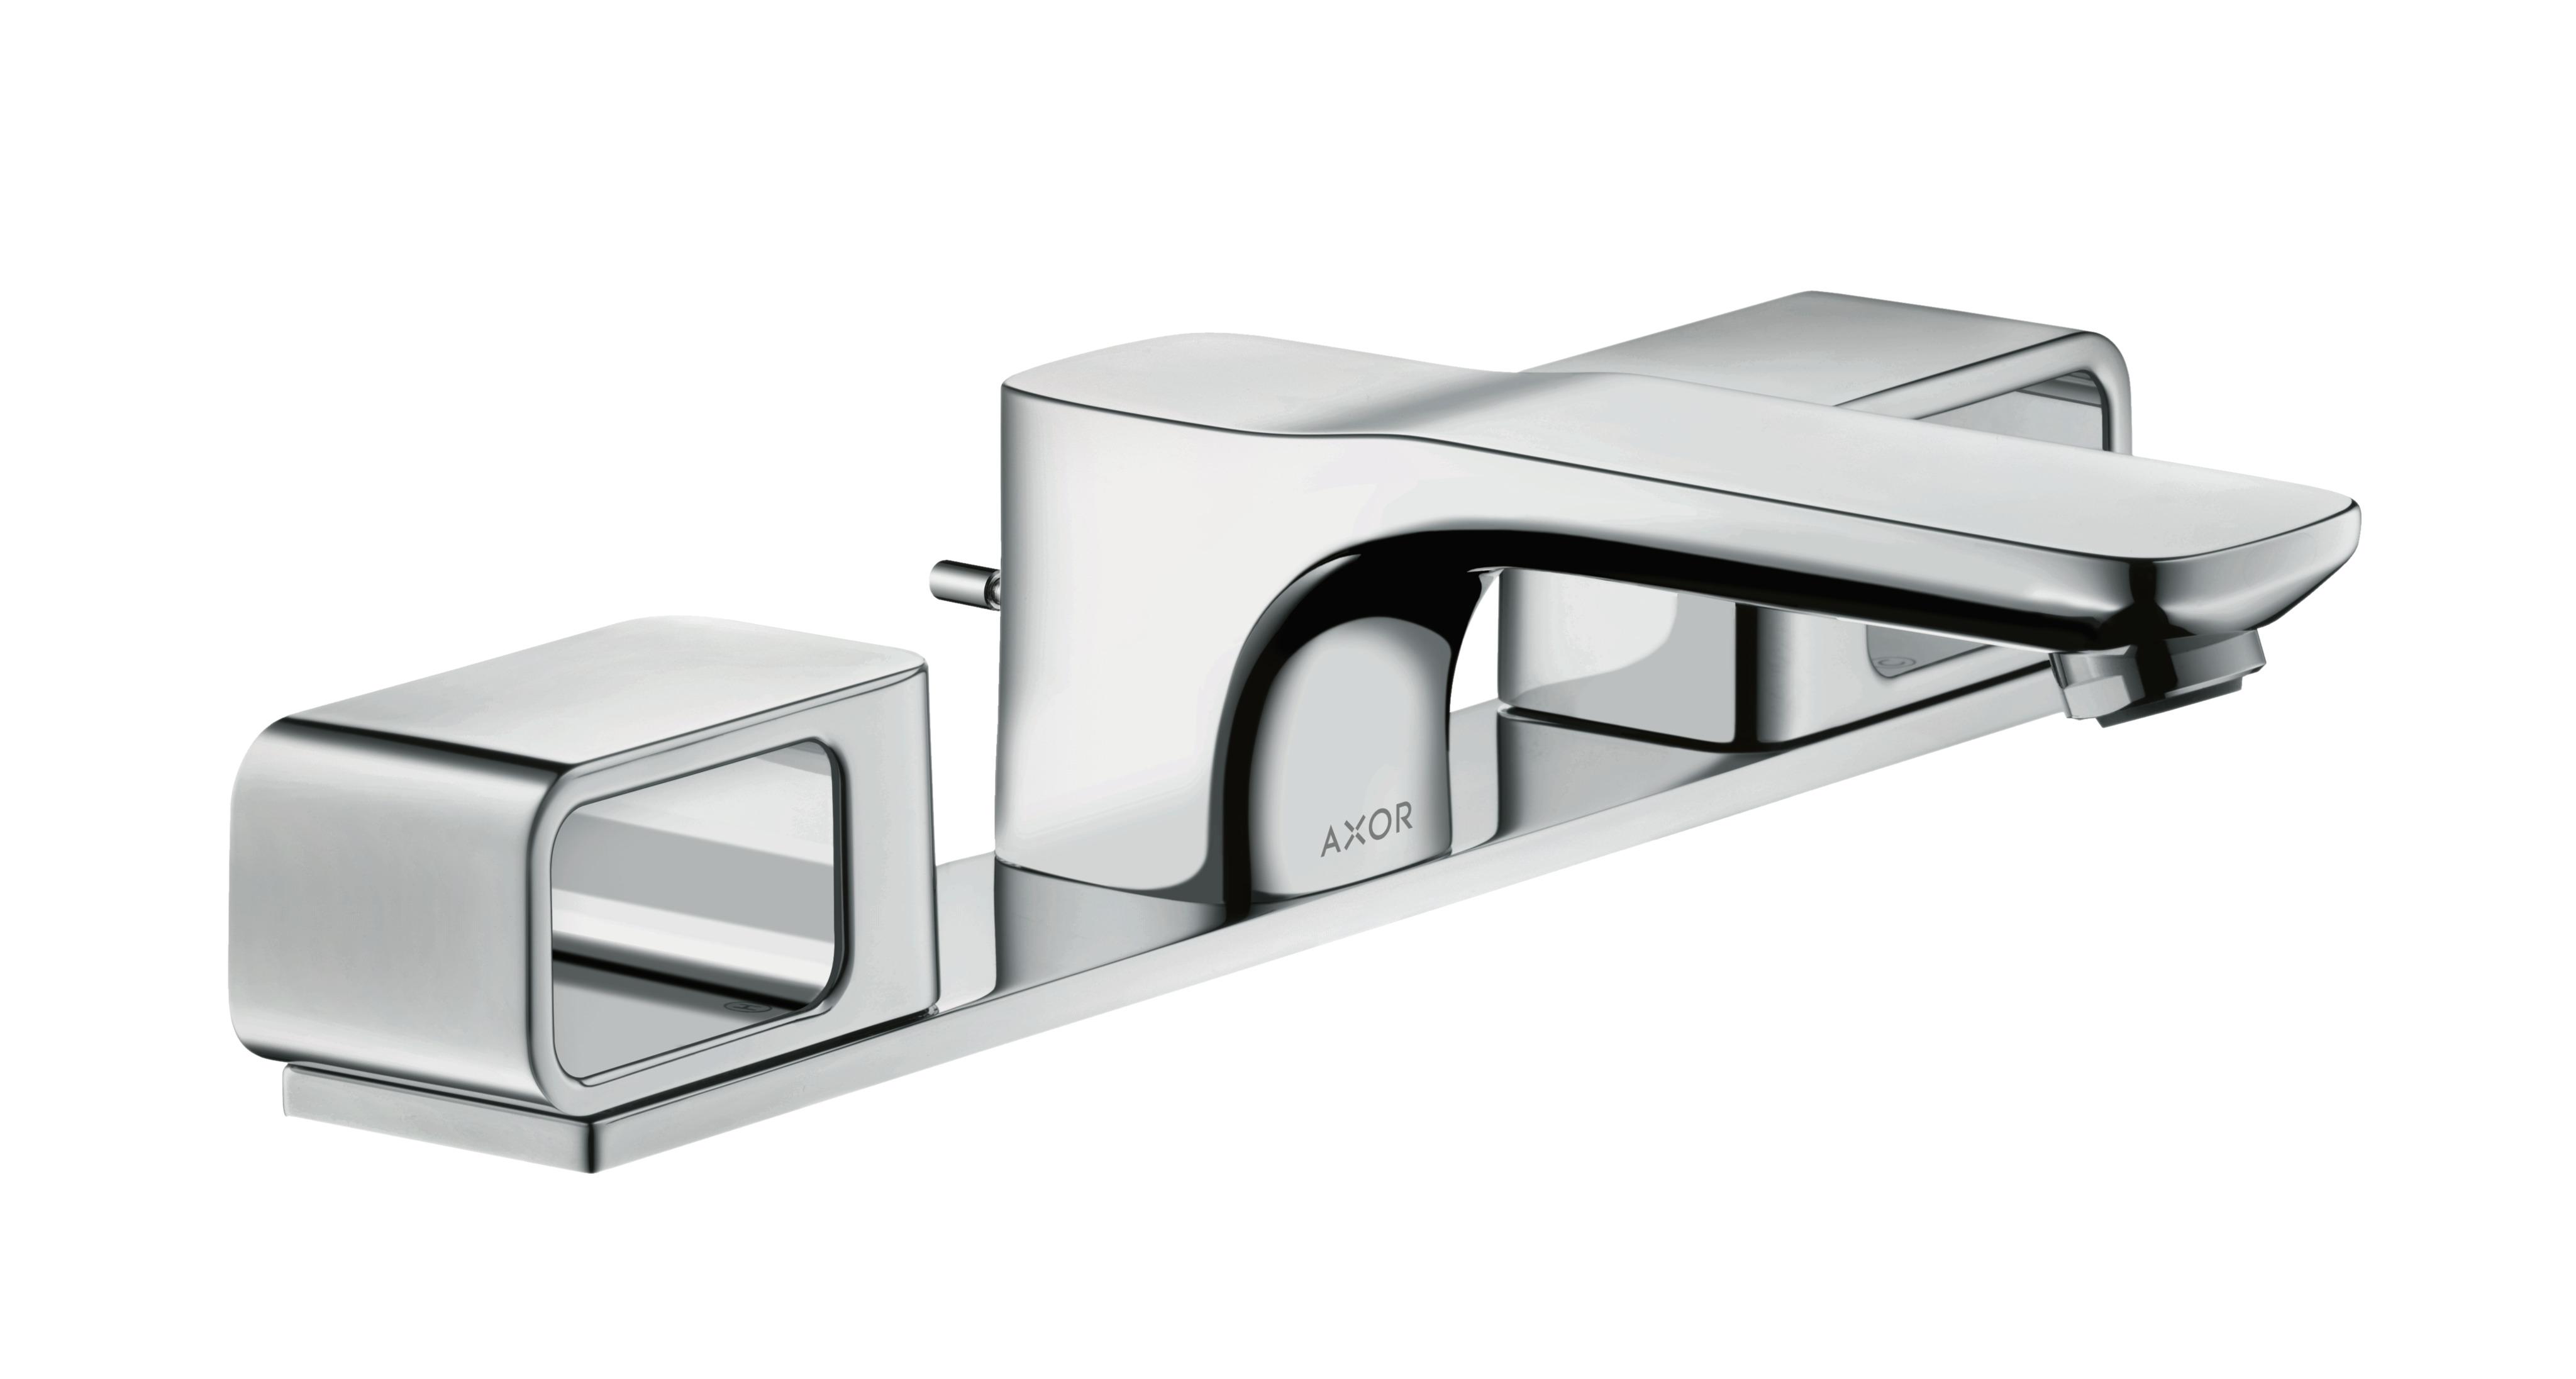 axor urquiola waschtischmischer chrom 11040000. Black Bedroom Furniture Sets. Home Design Ideas